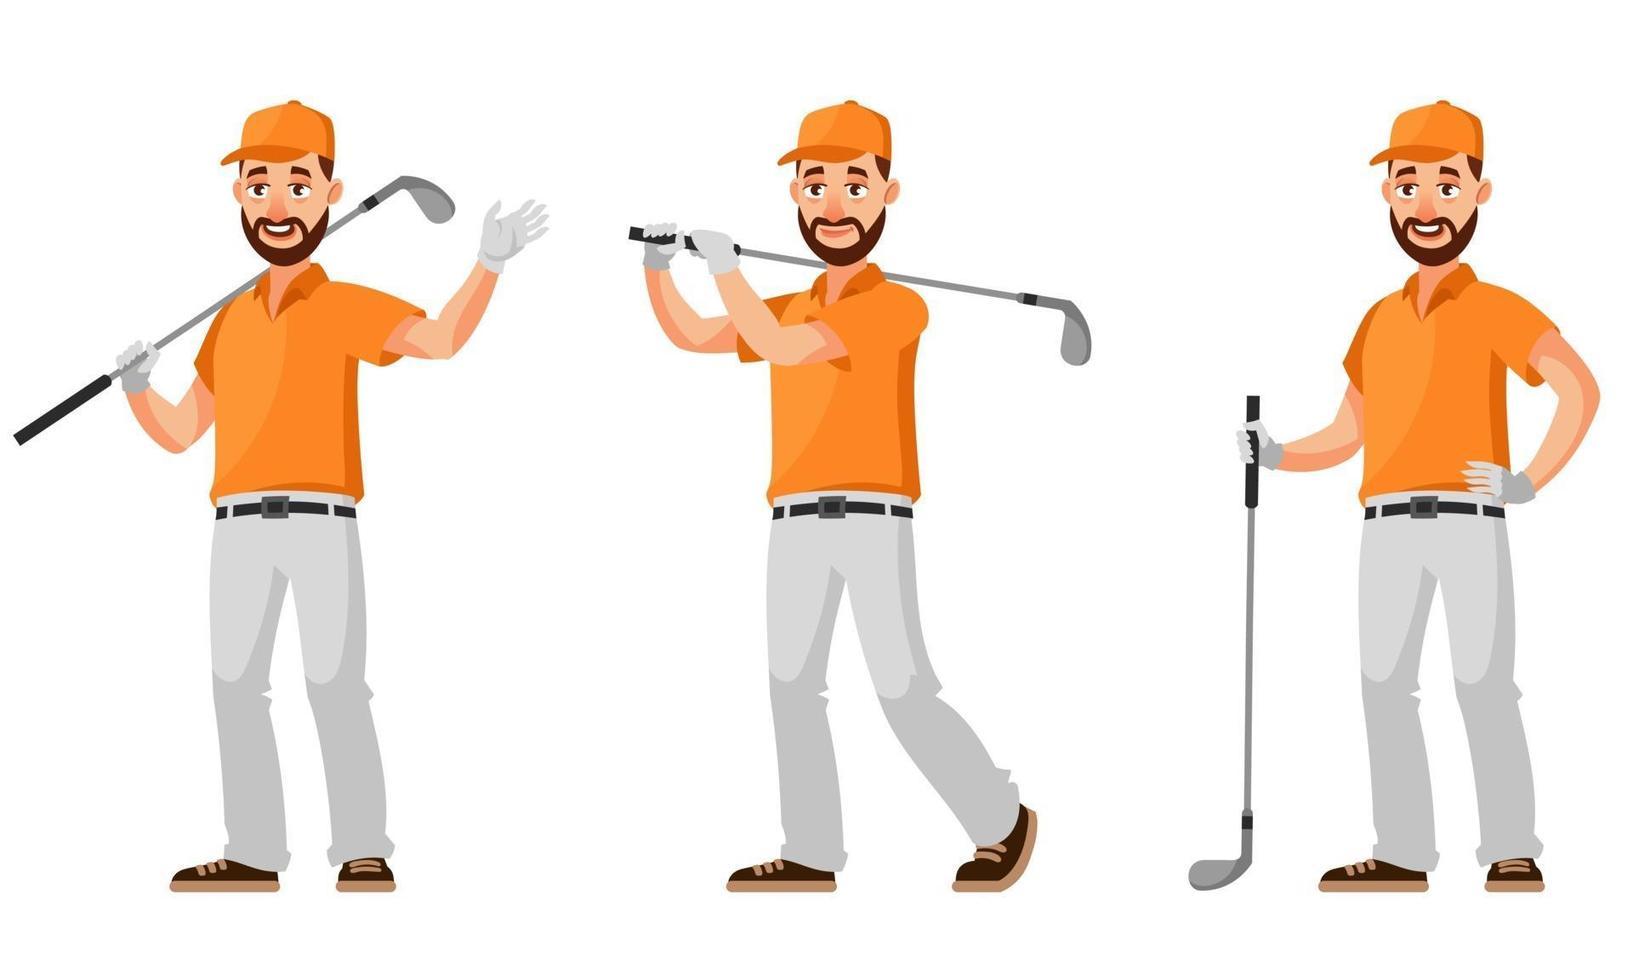 golfare i olika poser. vektor